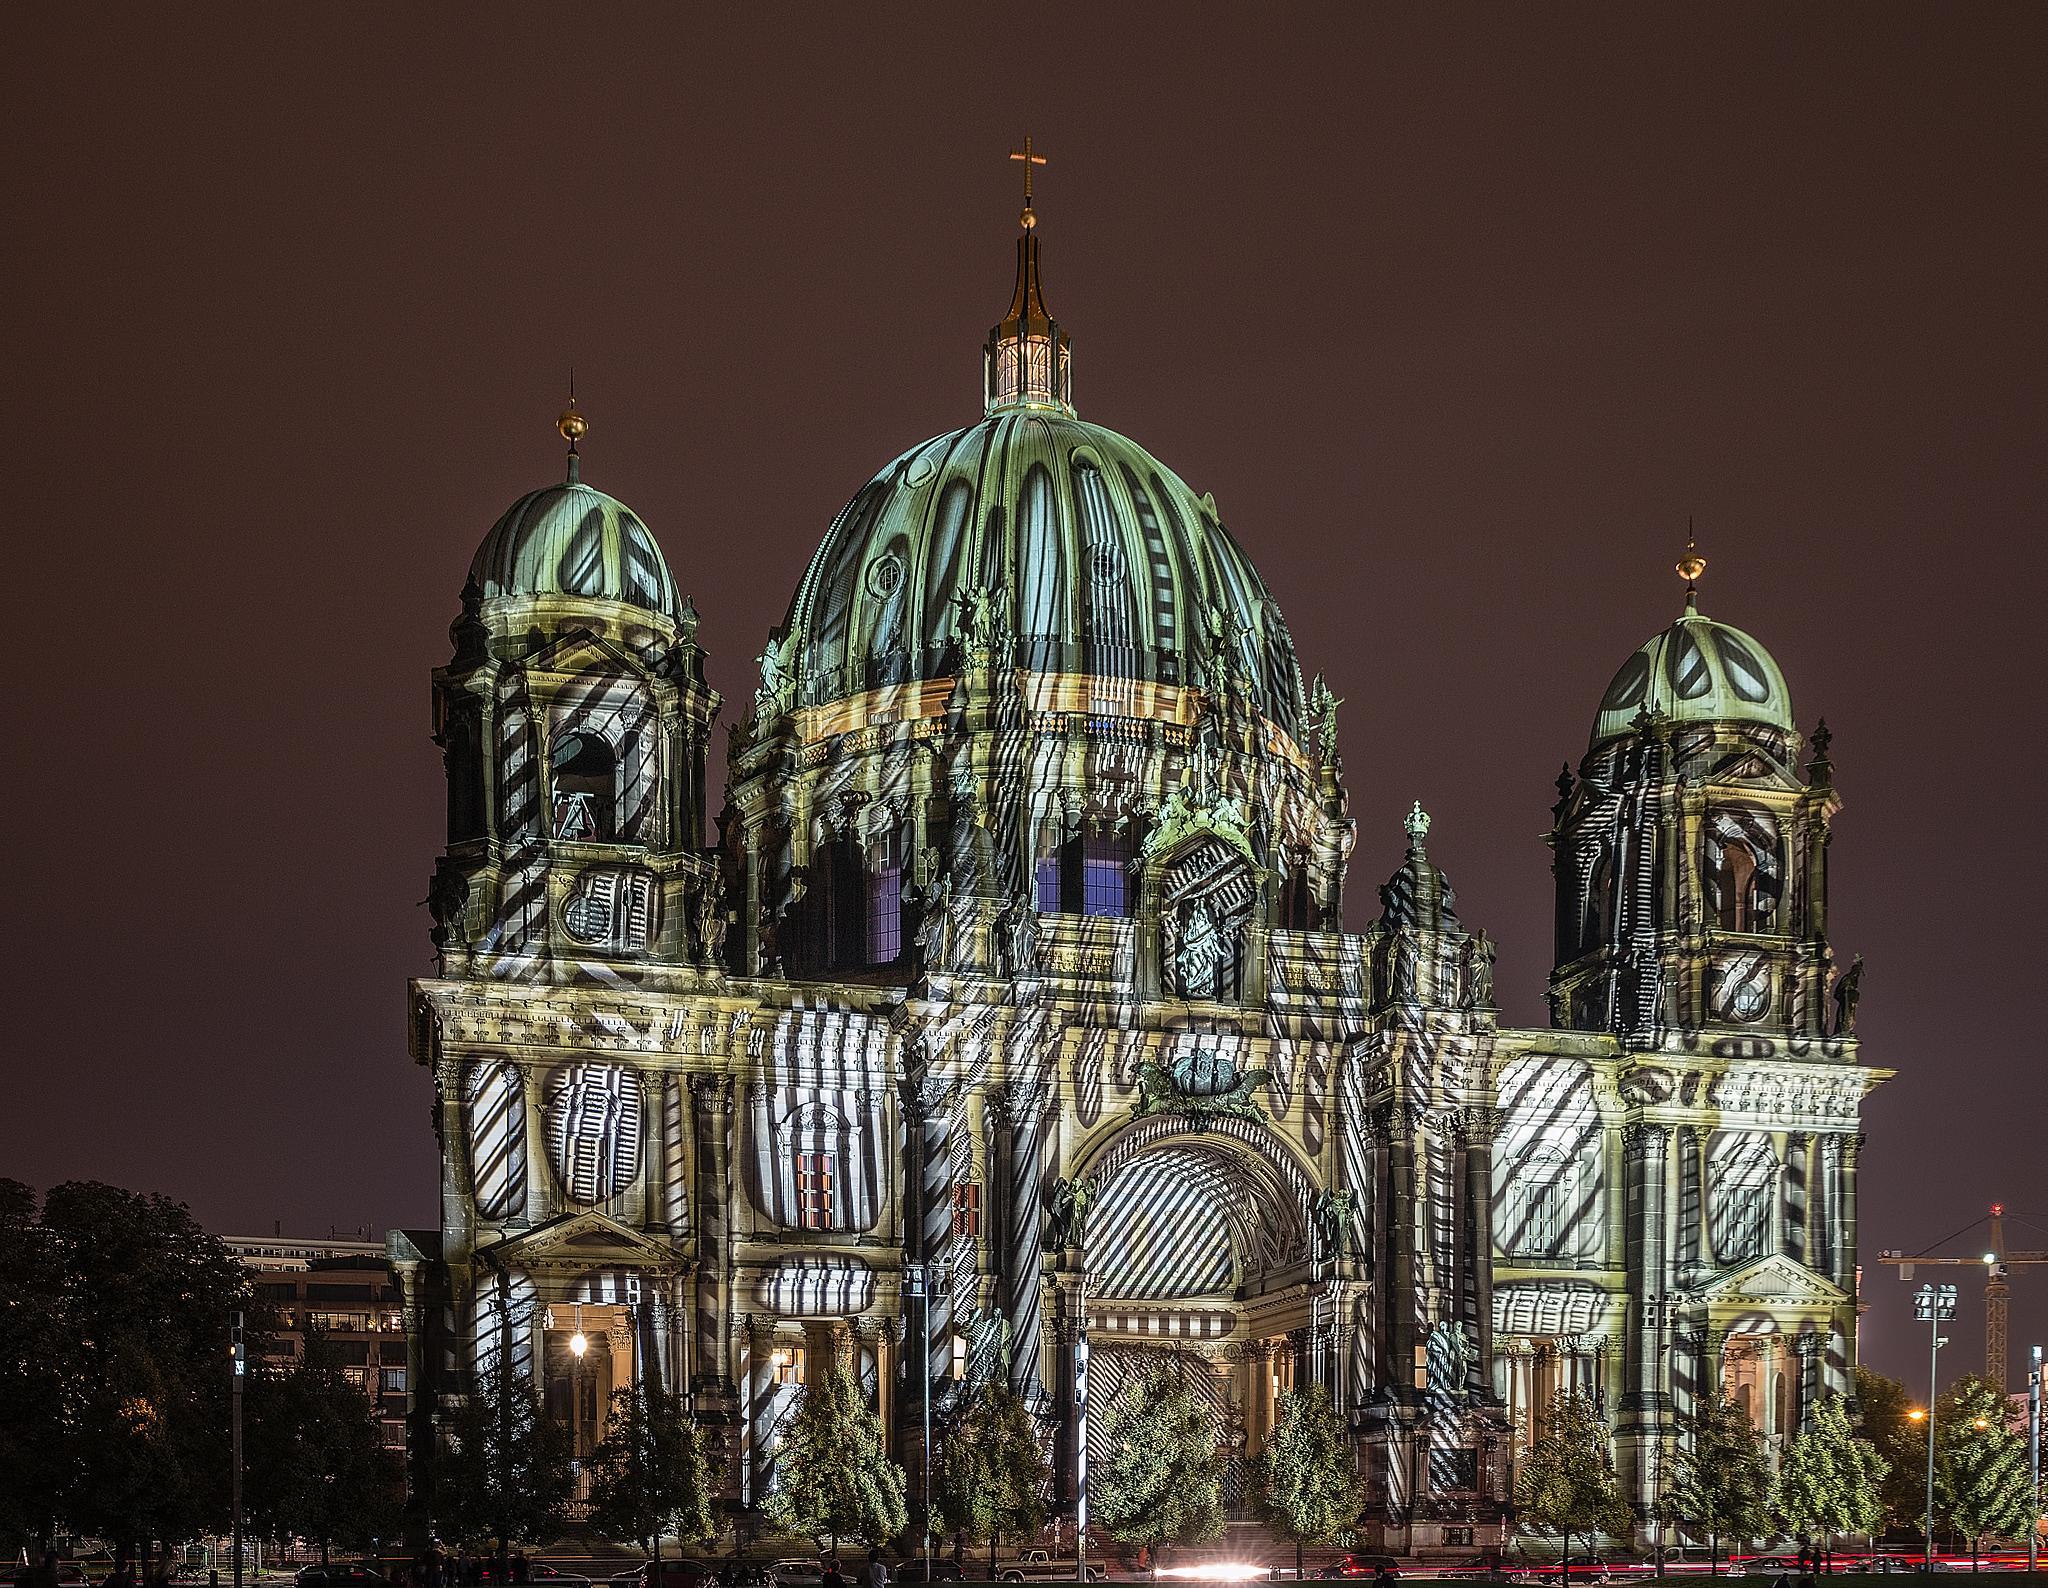 Berliner Dom - Fol 8 by Frank Haase